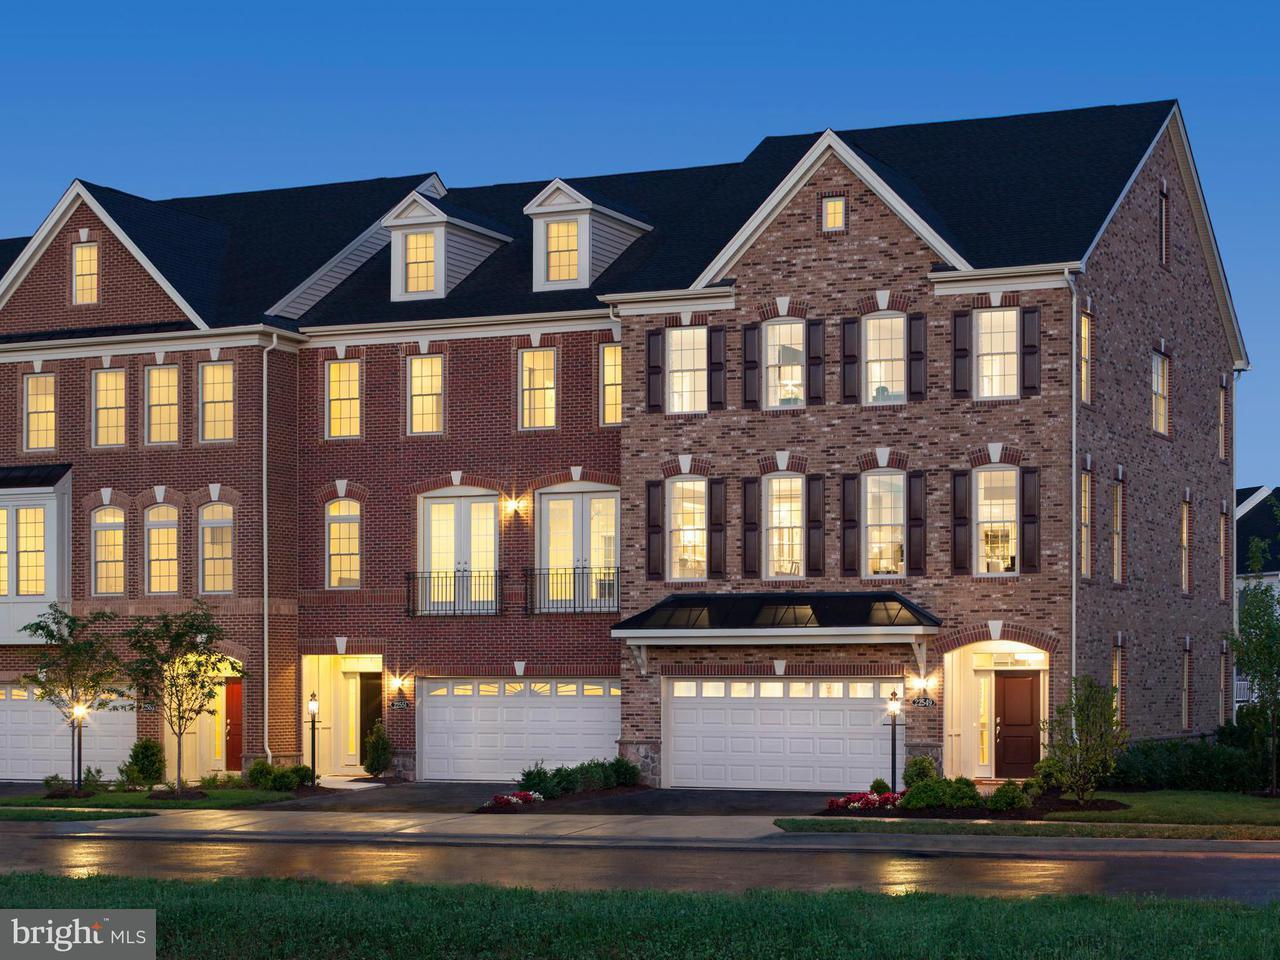 Townhouse for Sale at 22549 WINDSOR LOCKS SQ 22549 WINDSOR LOCKS SQ Ashburn, Virginia 20148 United States